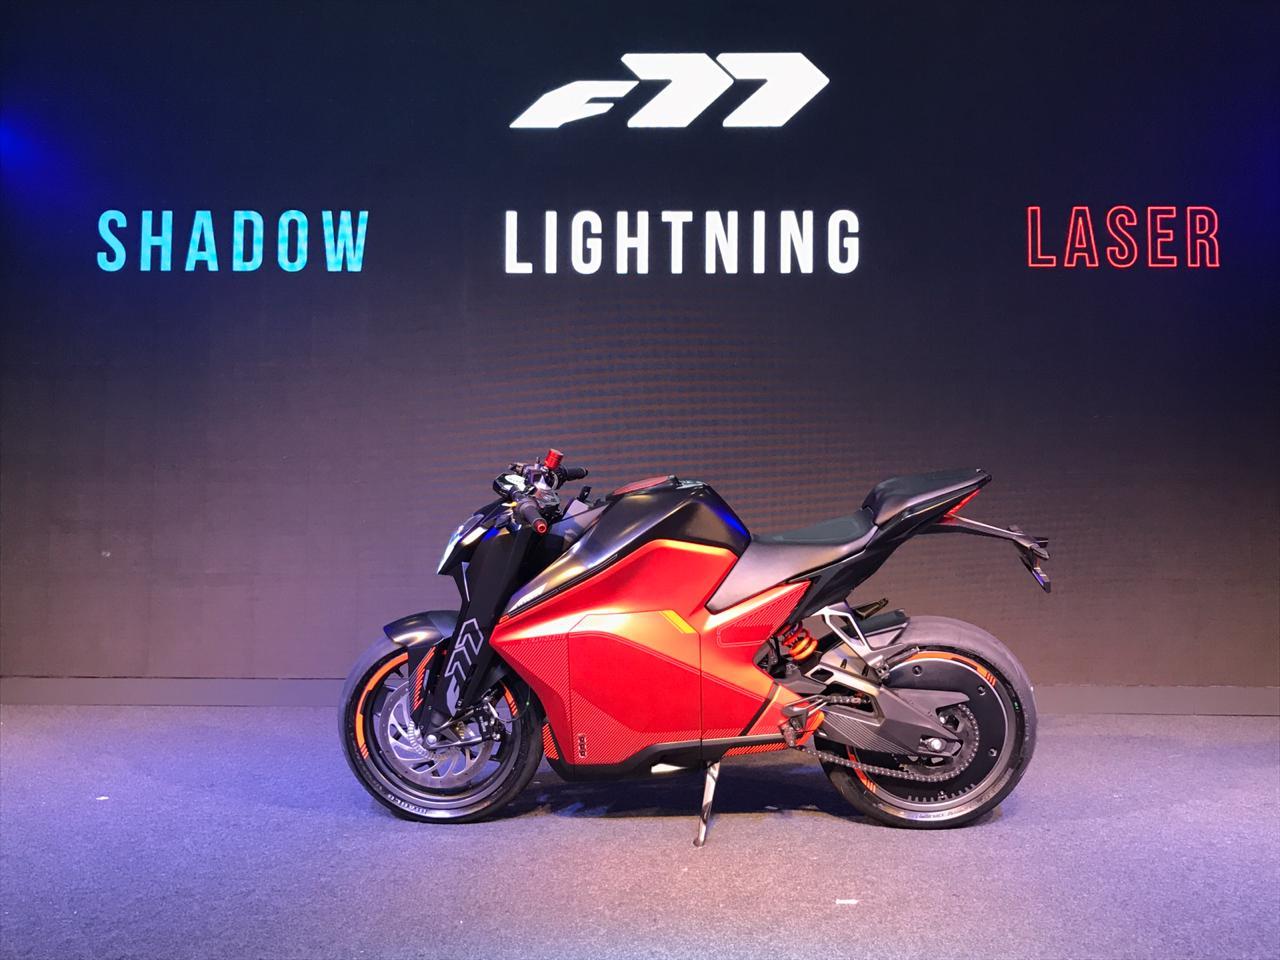 Ultraviolette F77 Electric Bike: Same Price, Other Options